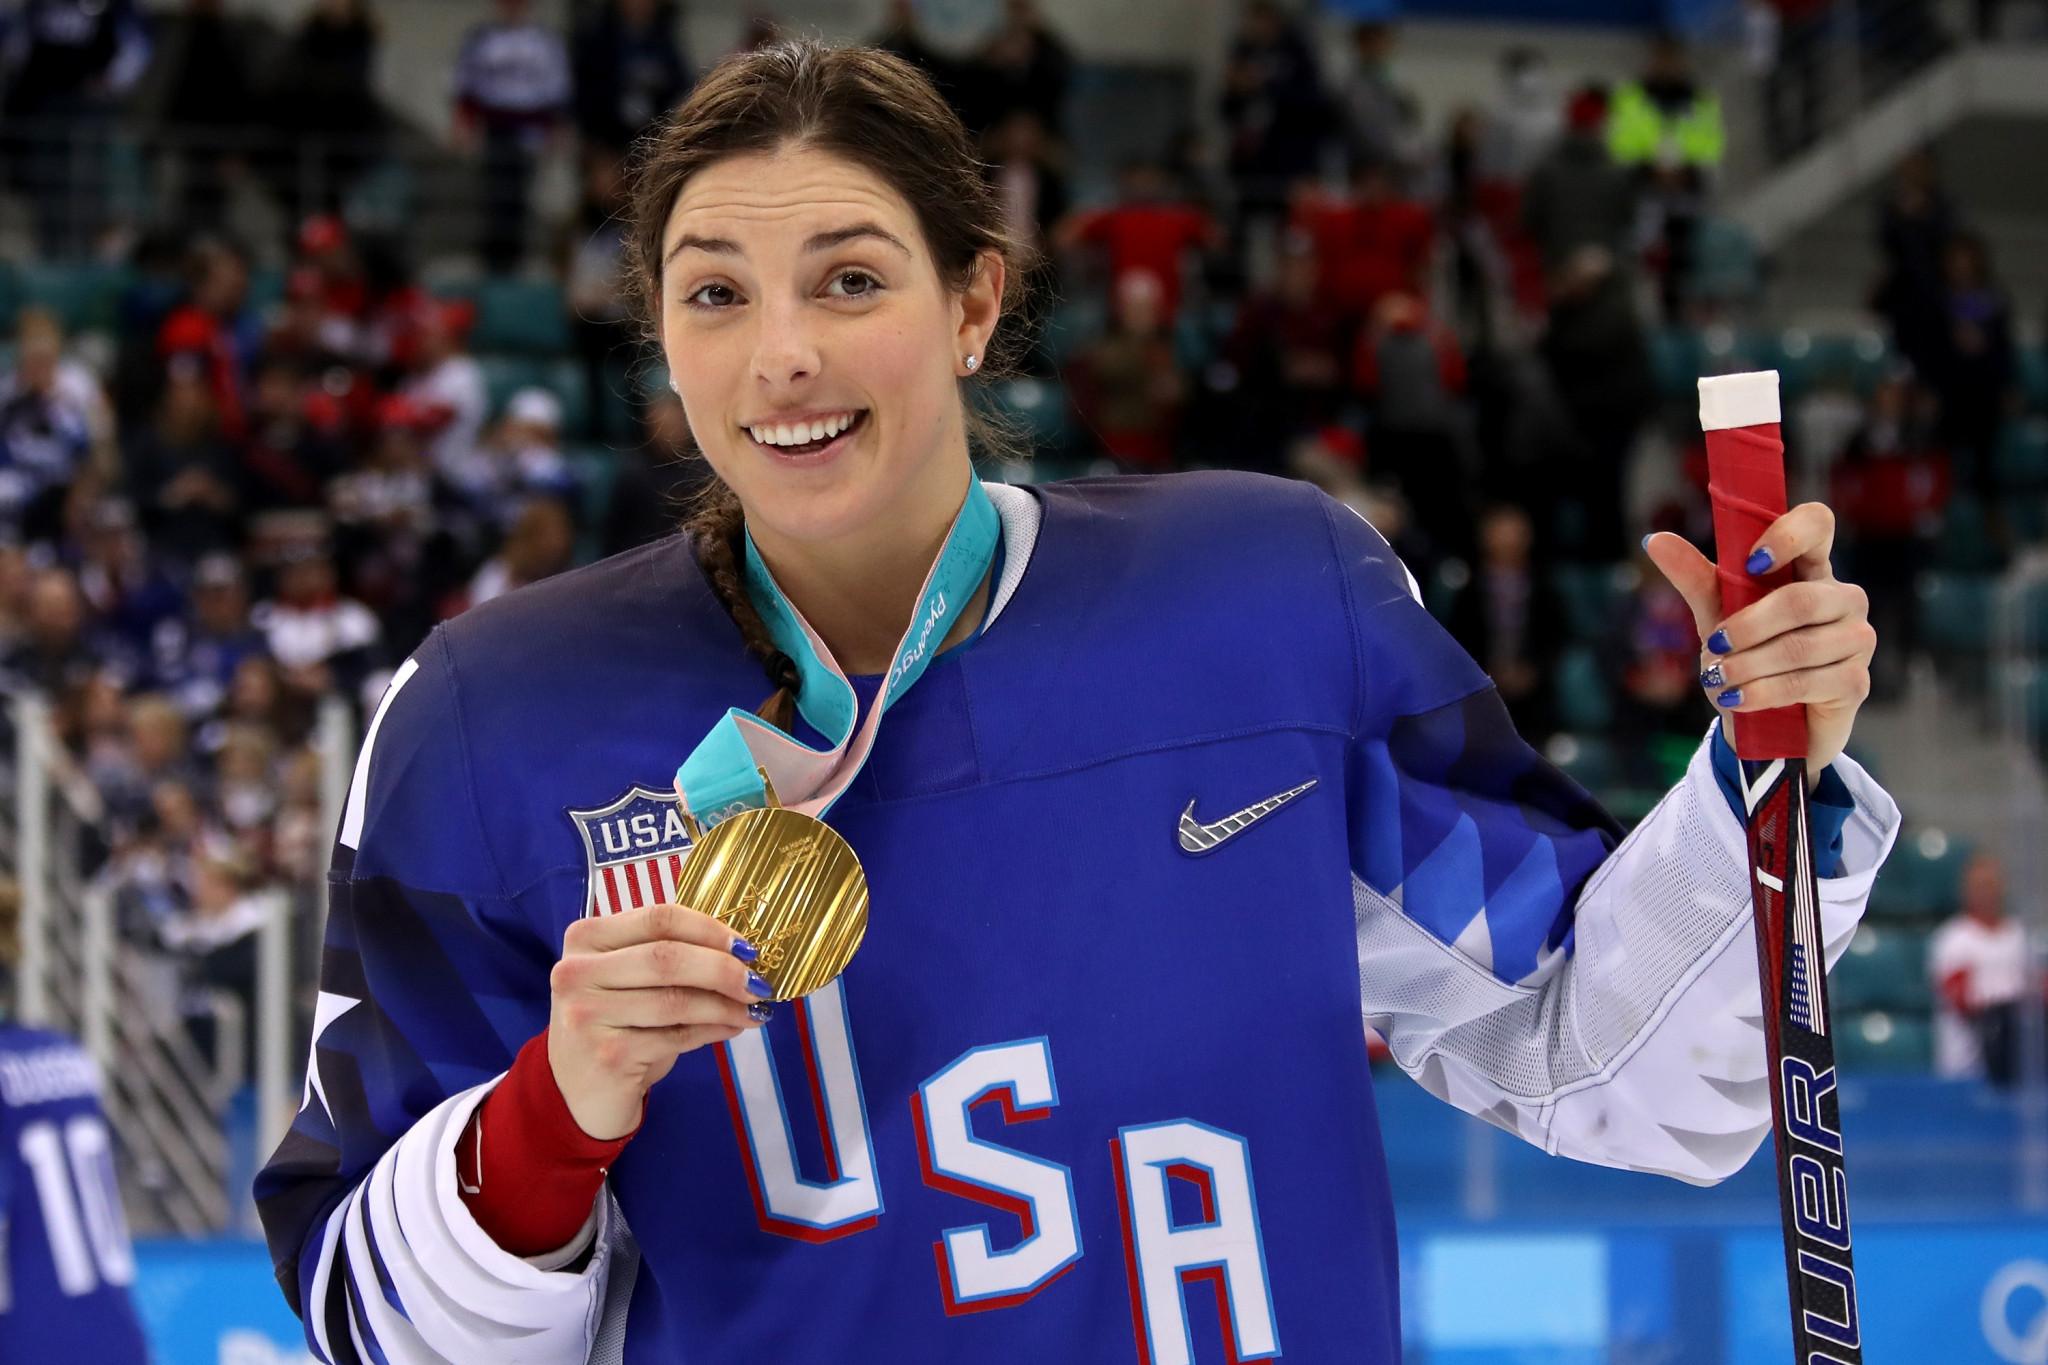 Knight breaks IIHF Women's World Championship goalscoring record as US and Canada win again